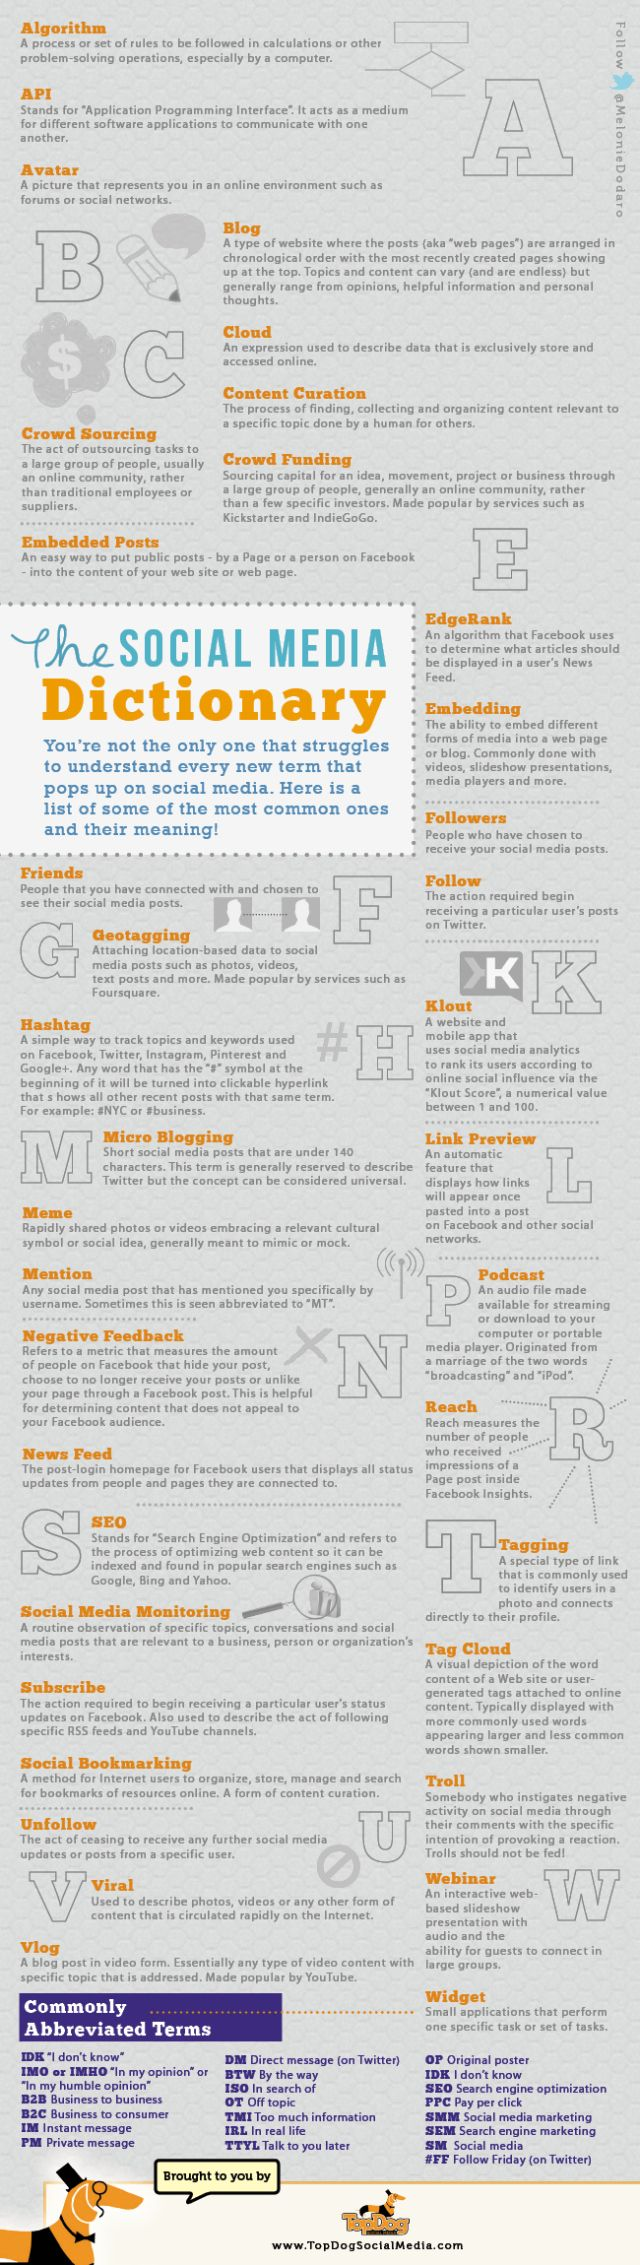 SOCIAL MEDIA -         The Social Media dictionary  #infographic #socialmedia